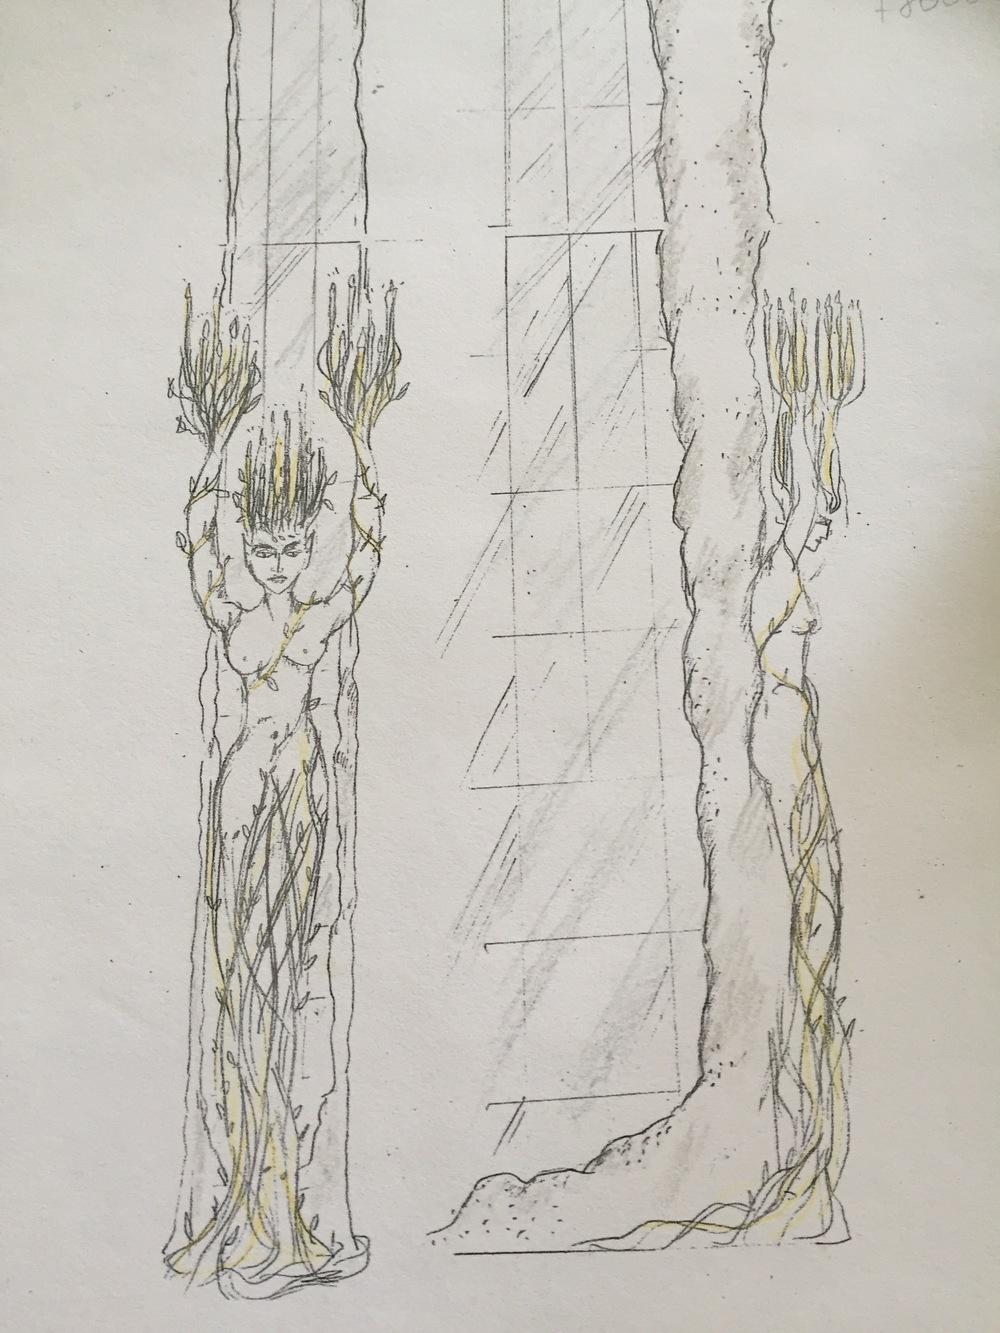 Sleeping Beauty ballet - producction design - David Roger 3.jpg